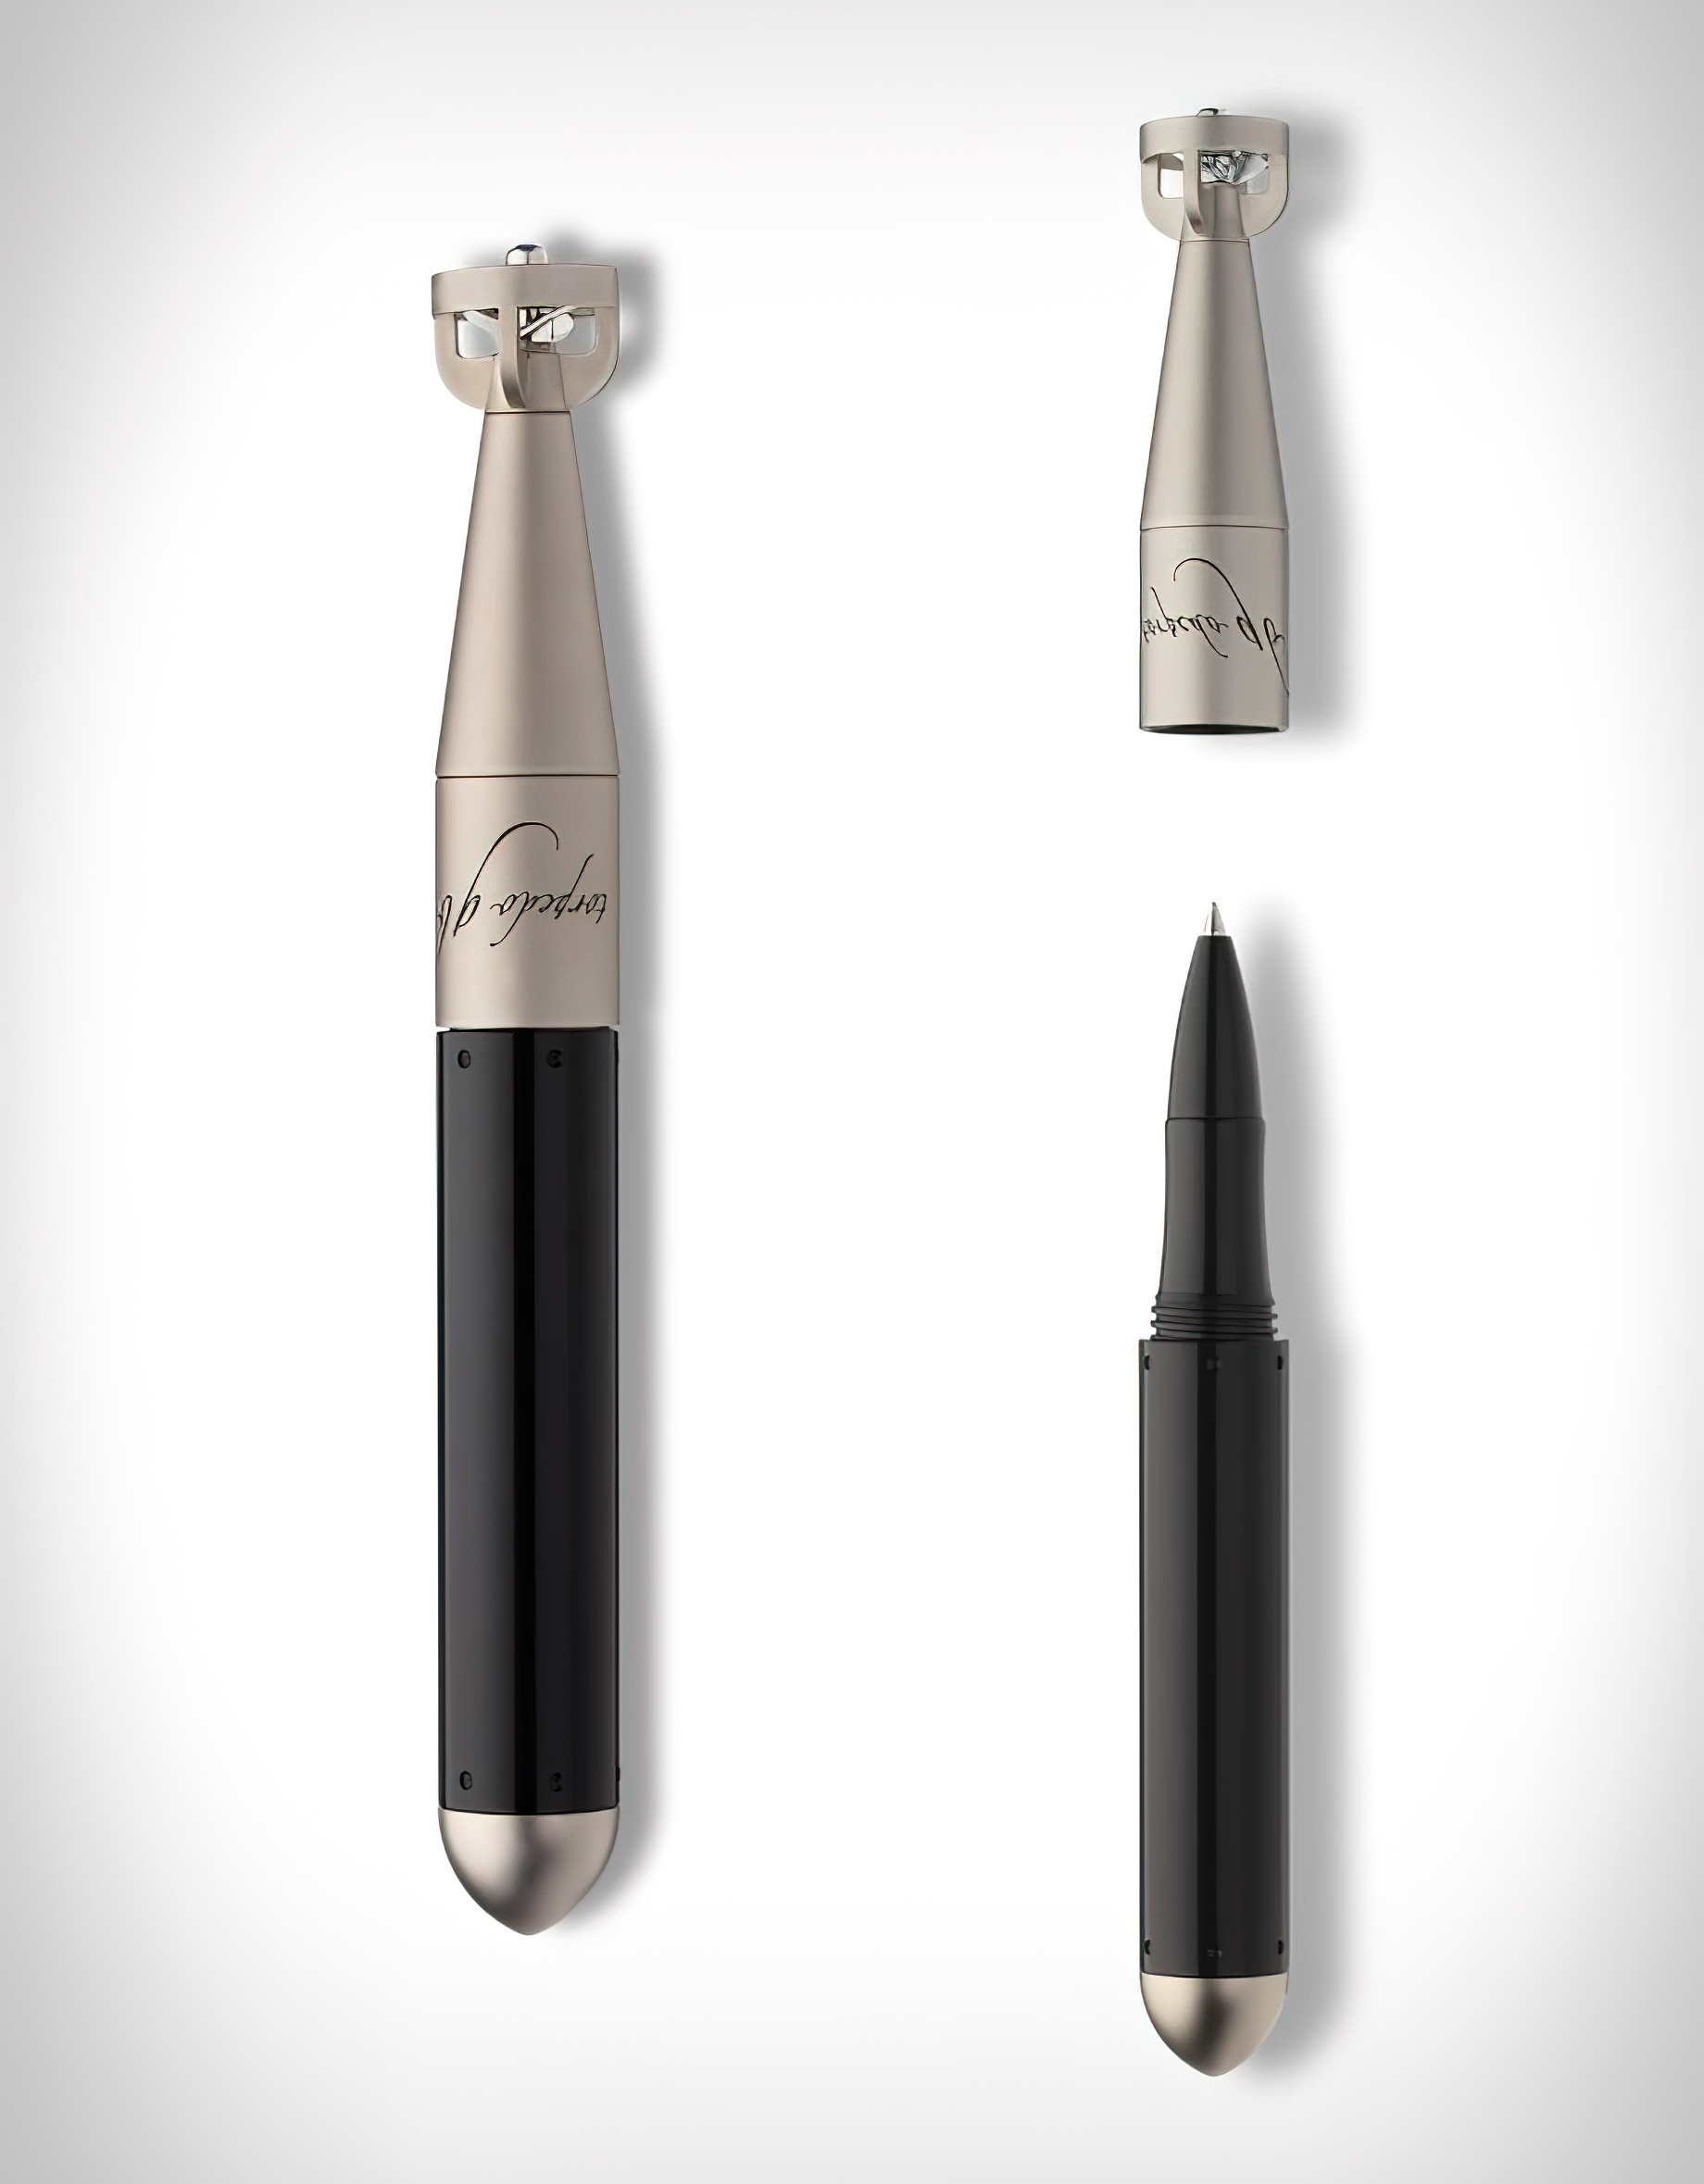 Torpedo GB Pen Luxury Collection – Rijeka, Croatia – Torpedo GB Writing Instruments